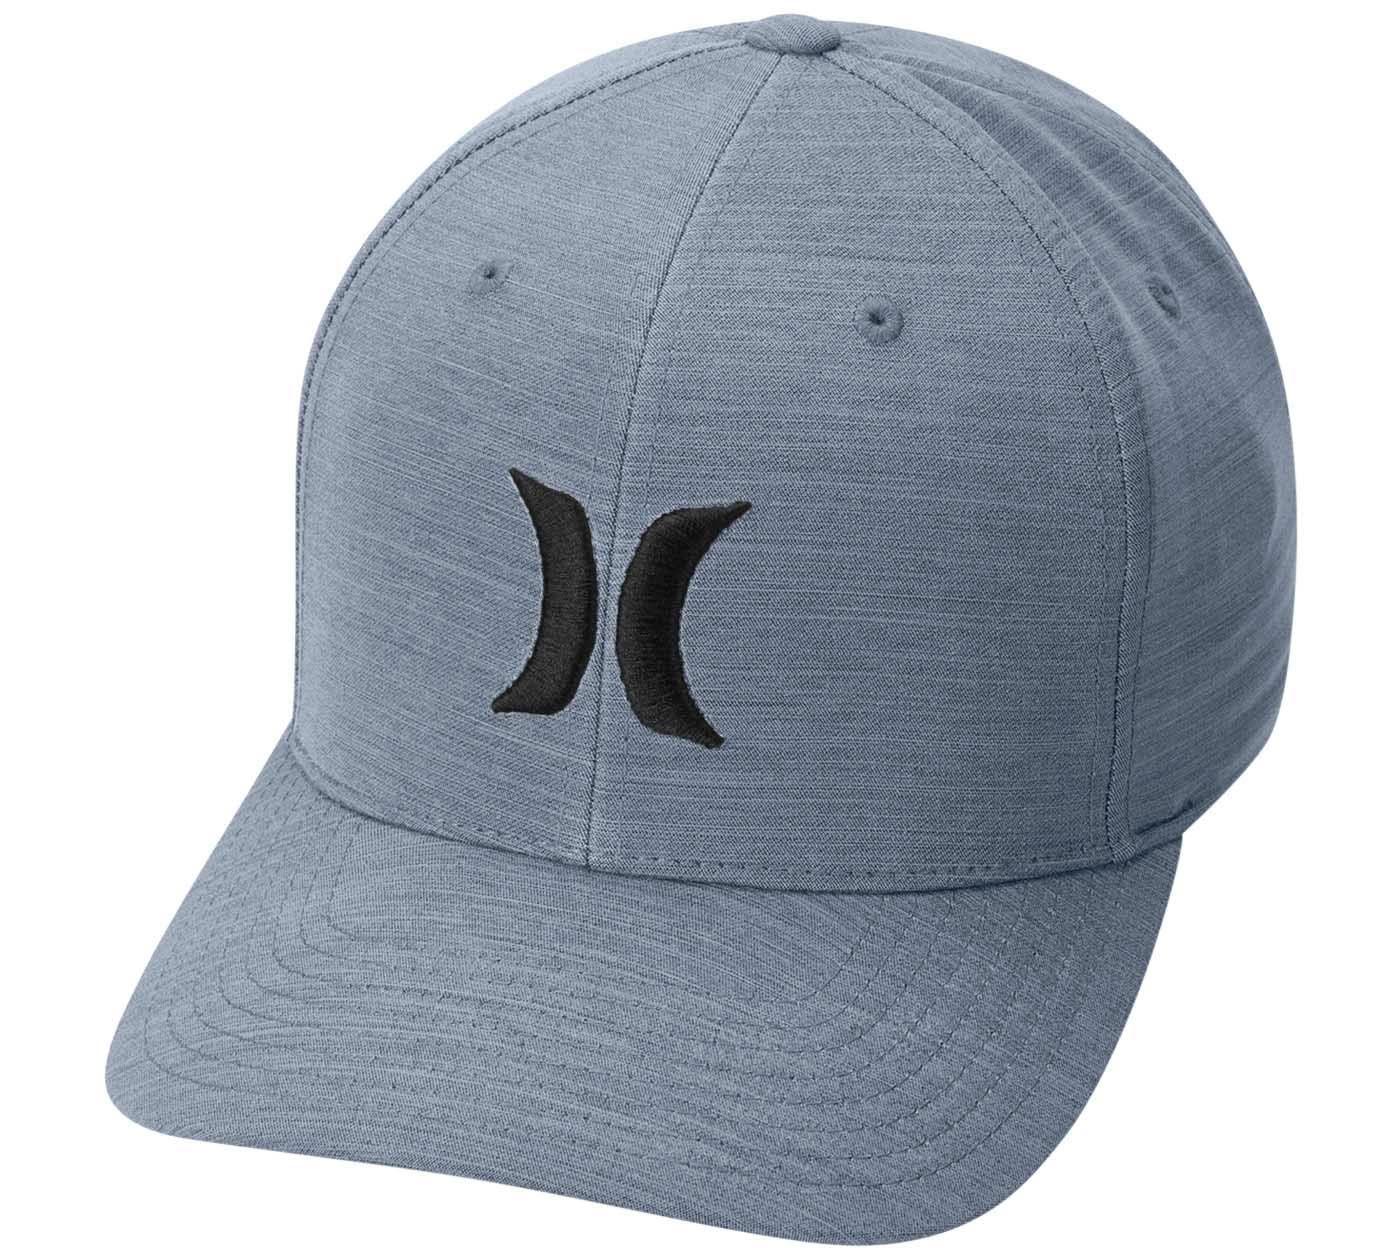 Hurley Men's Dri-FIT Cutback Hat